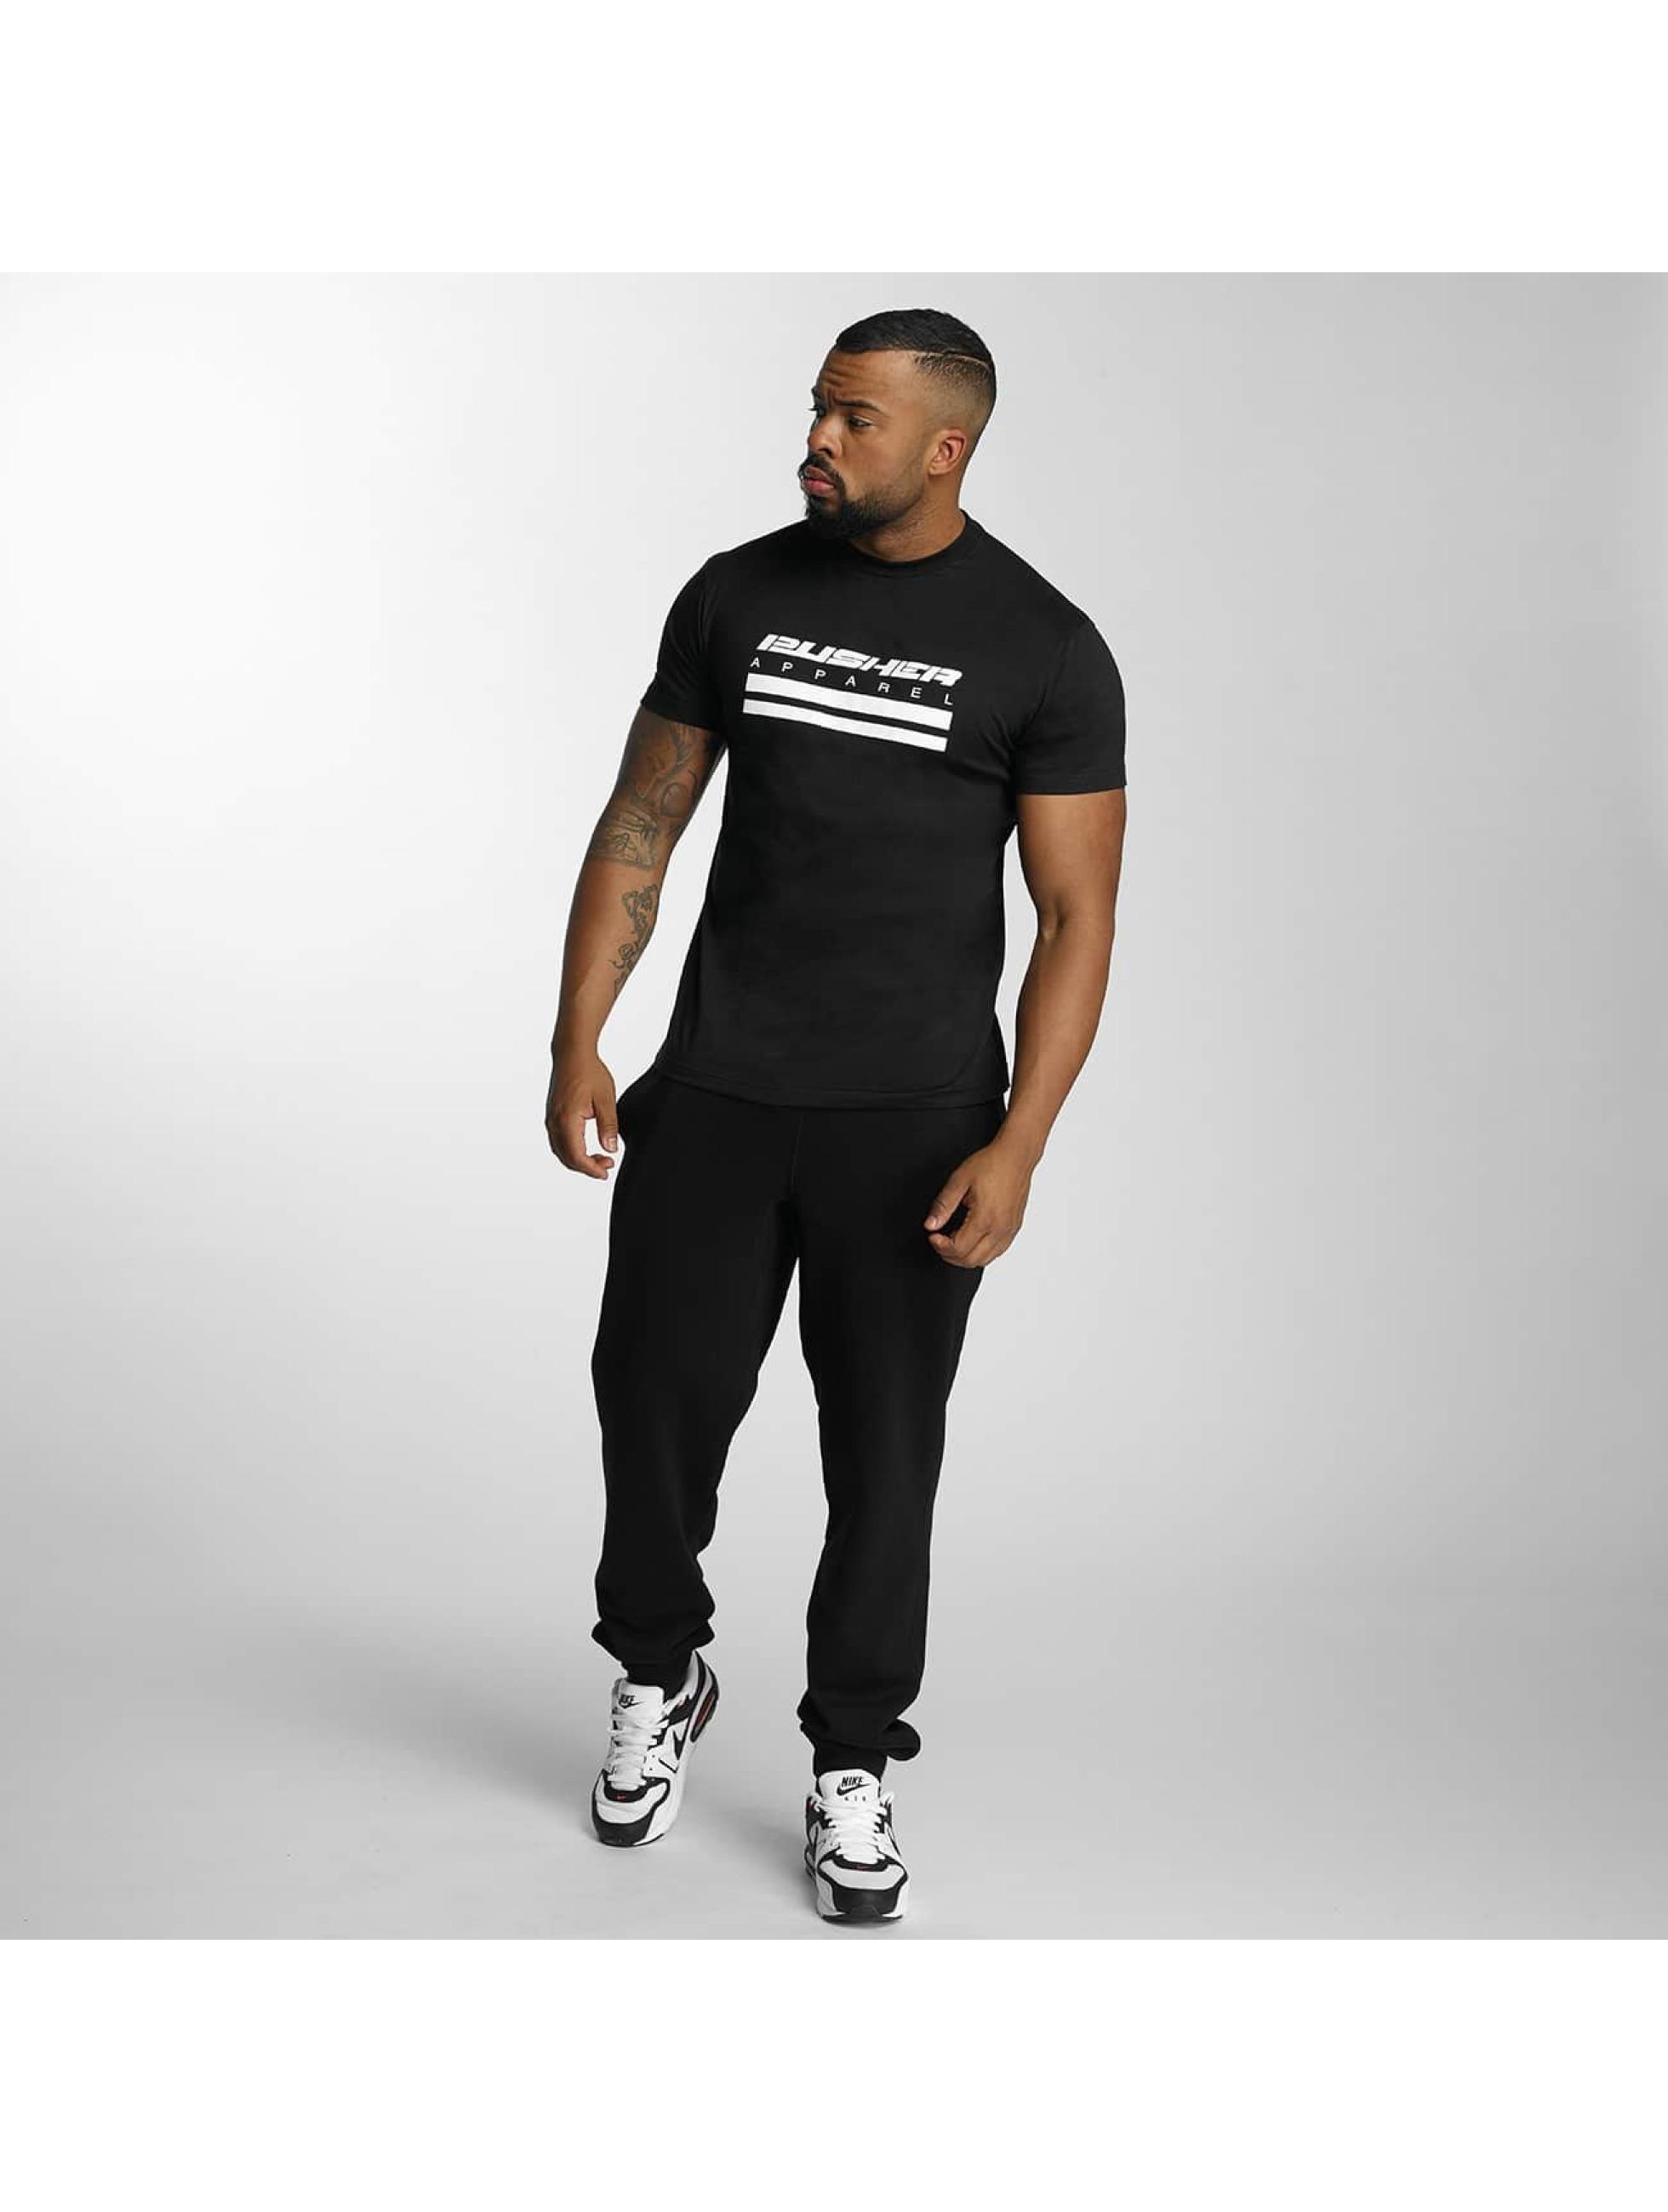 Pusher Apparel T-Shirt Apparel 503 Theft schwarz